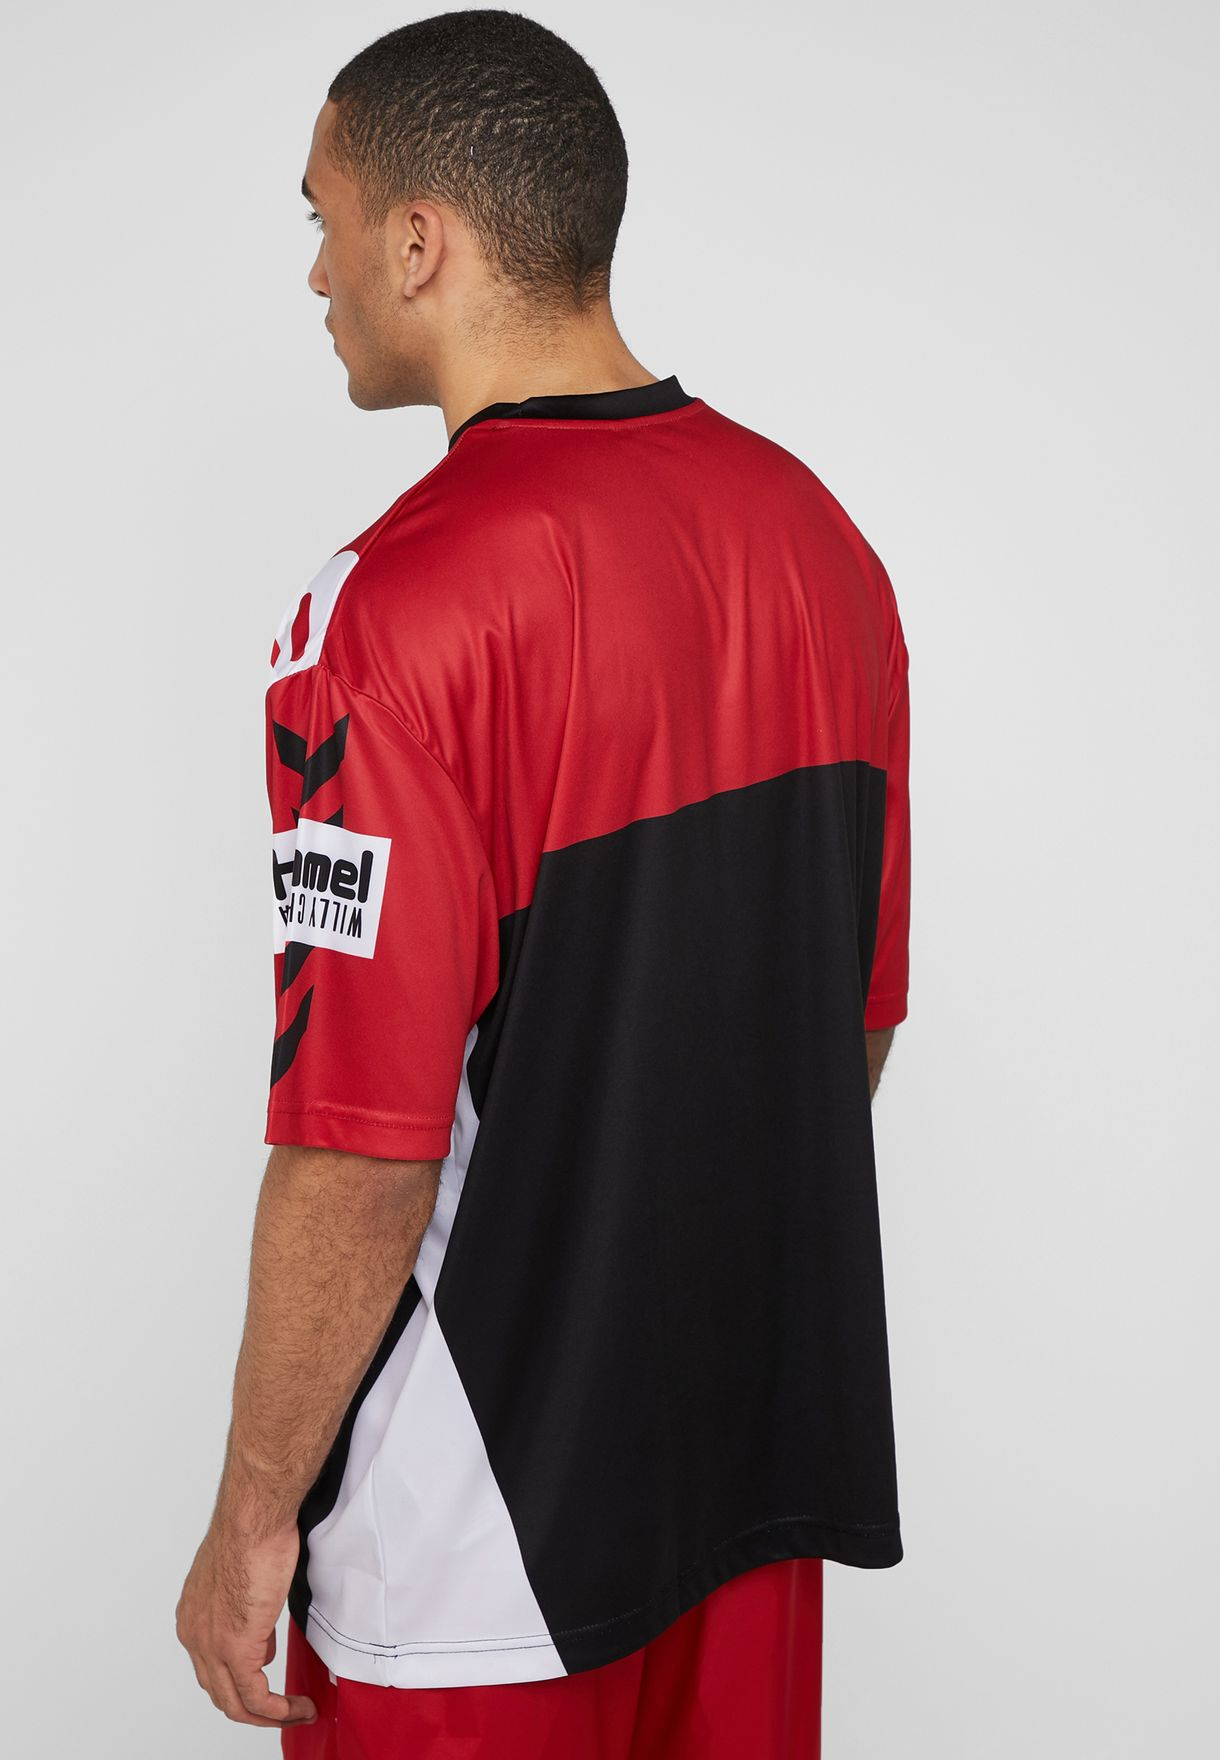 Hummel x Willy Chavarria Yell T-shirt